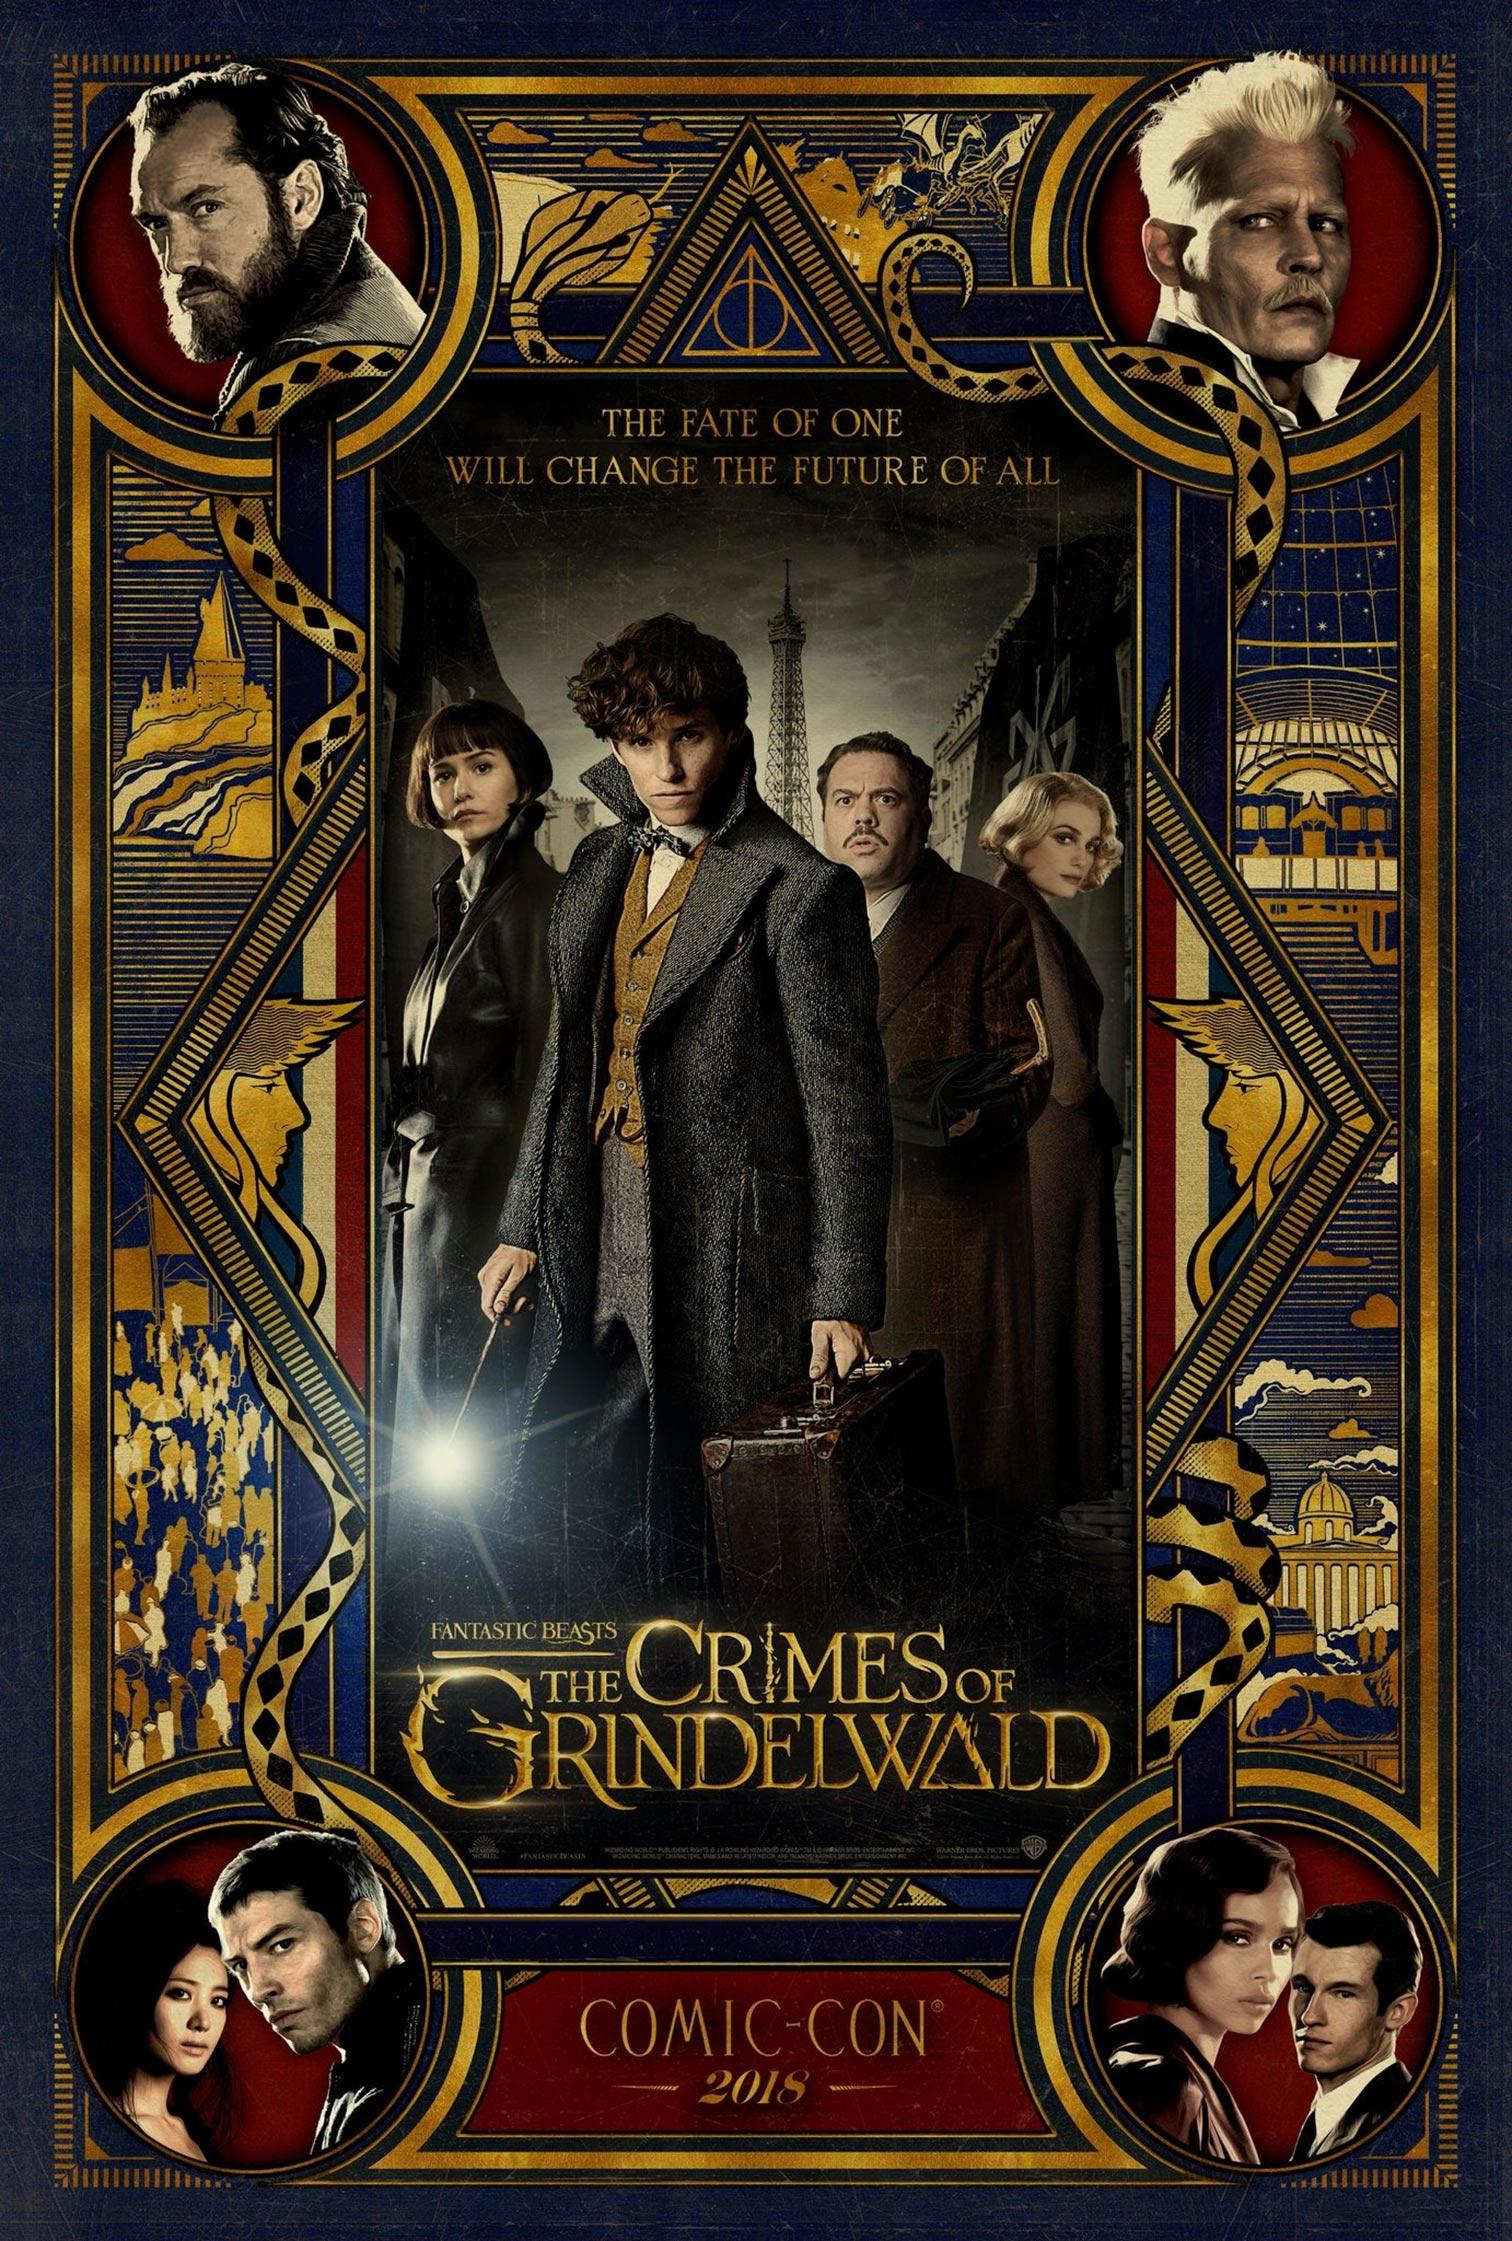 Fantastic Beasts: The Crimes of Grindelwald Poster #3